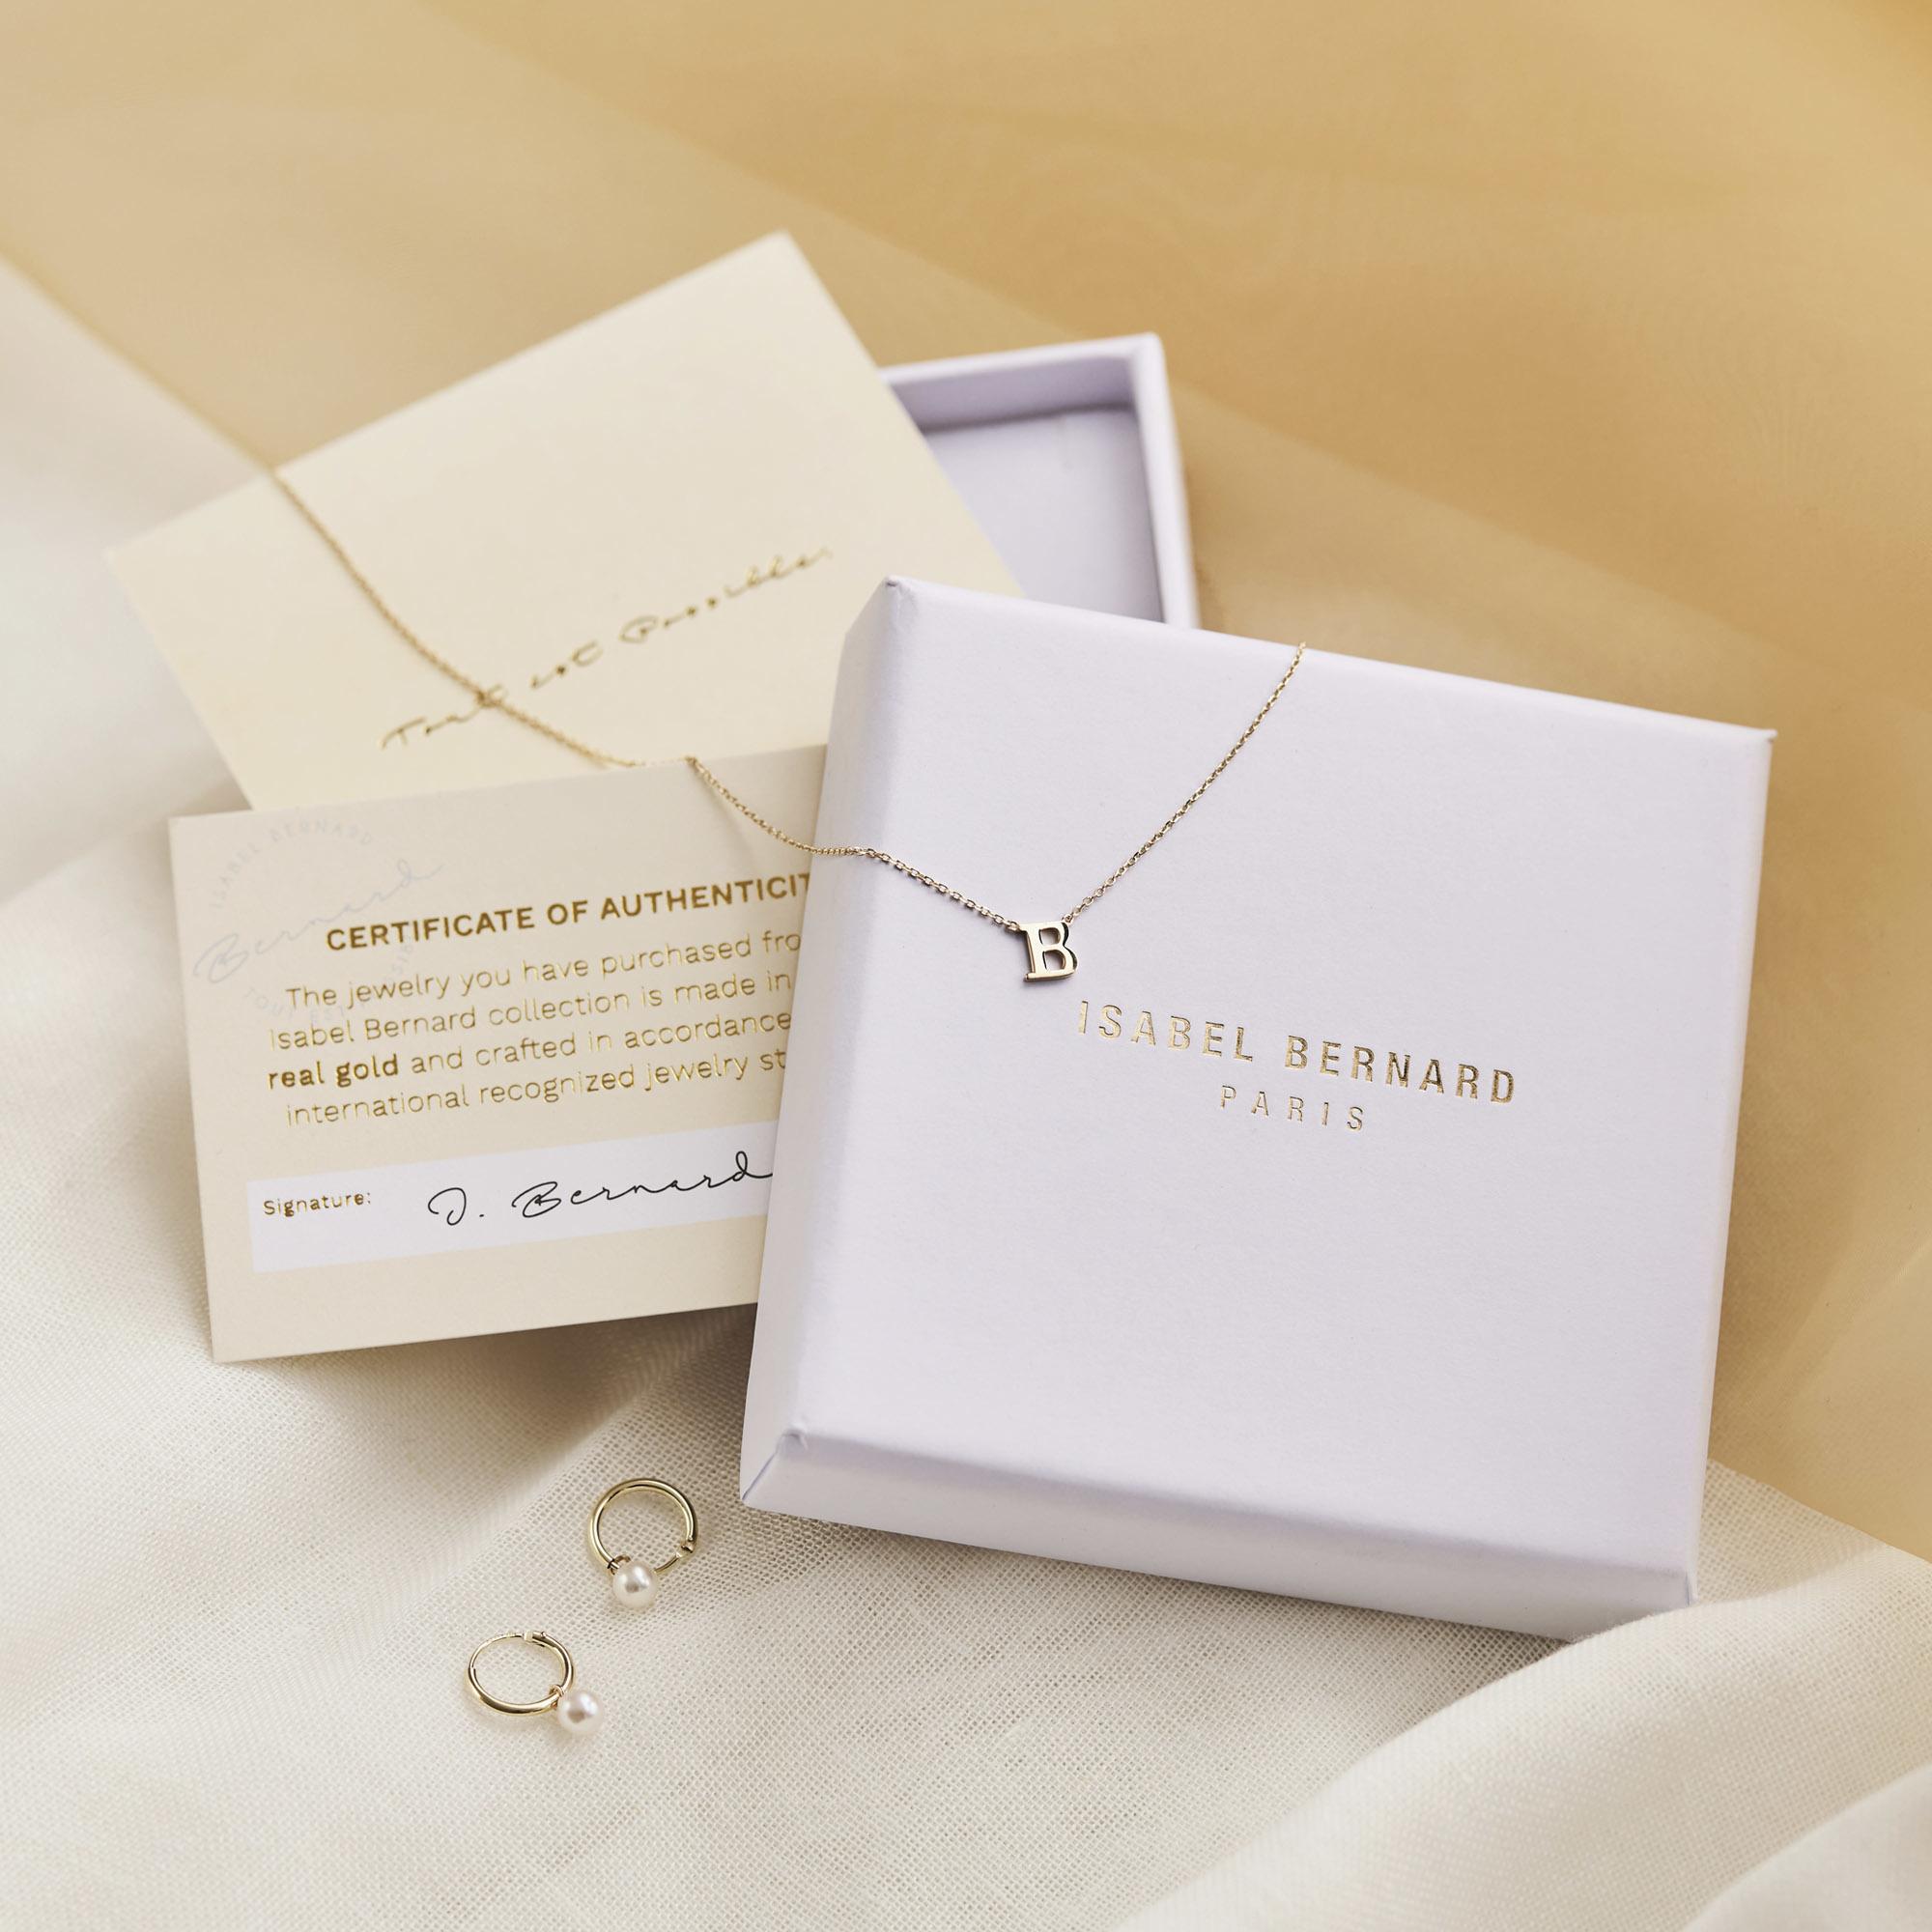 Isabel Bernard Le Marais Chloé 585er Goldkette mit Initialen Buchstaben